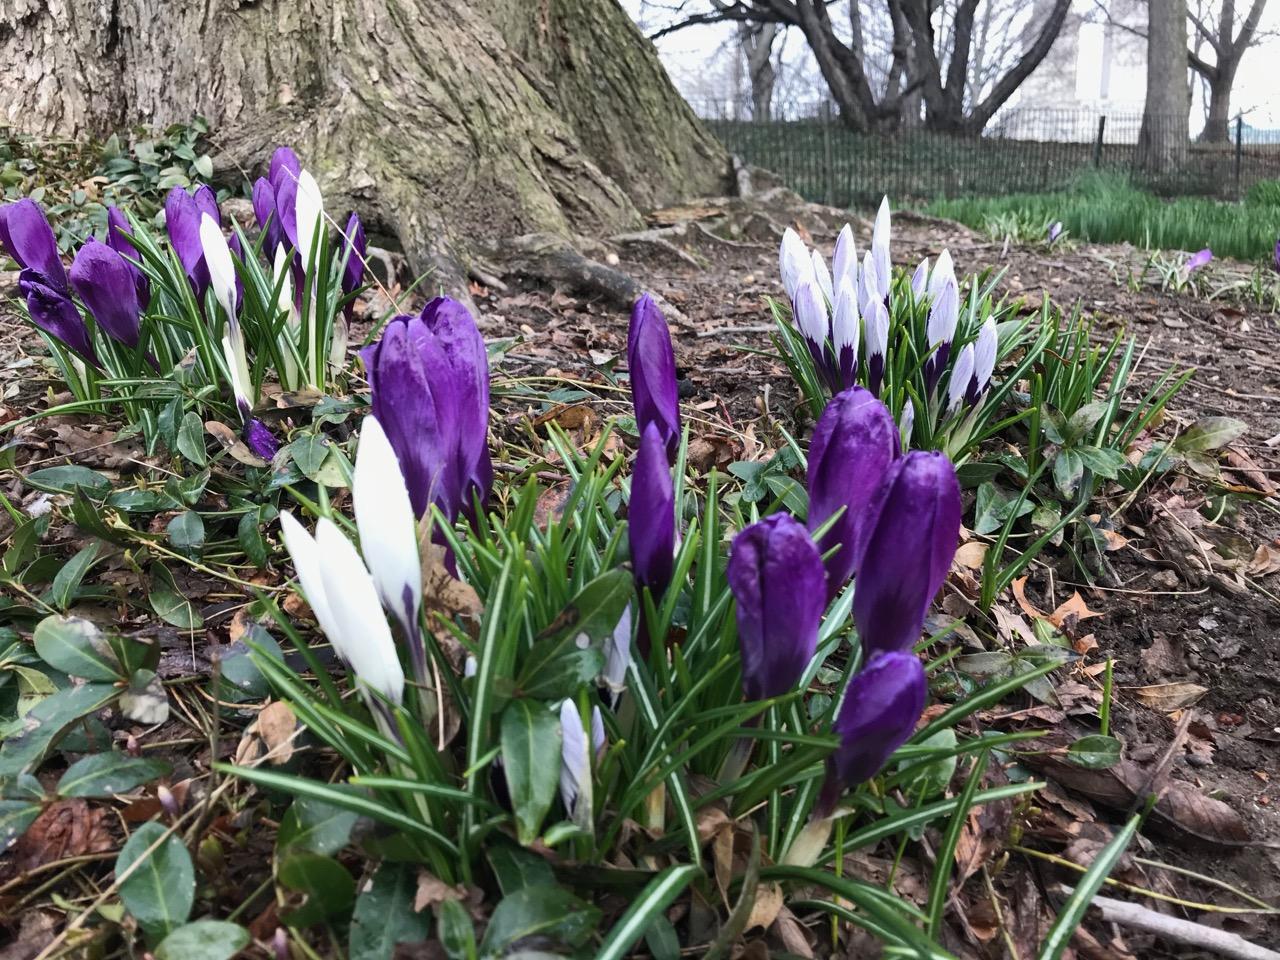 Crocus welcome spring temps